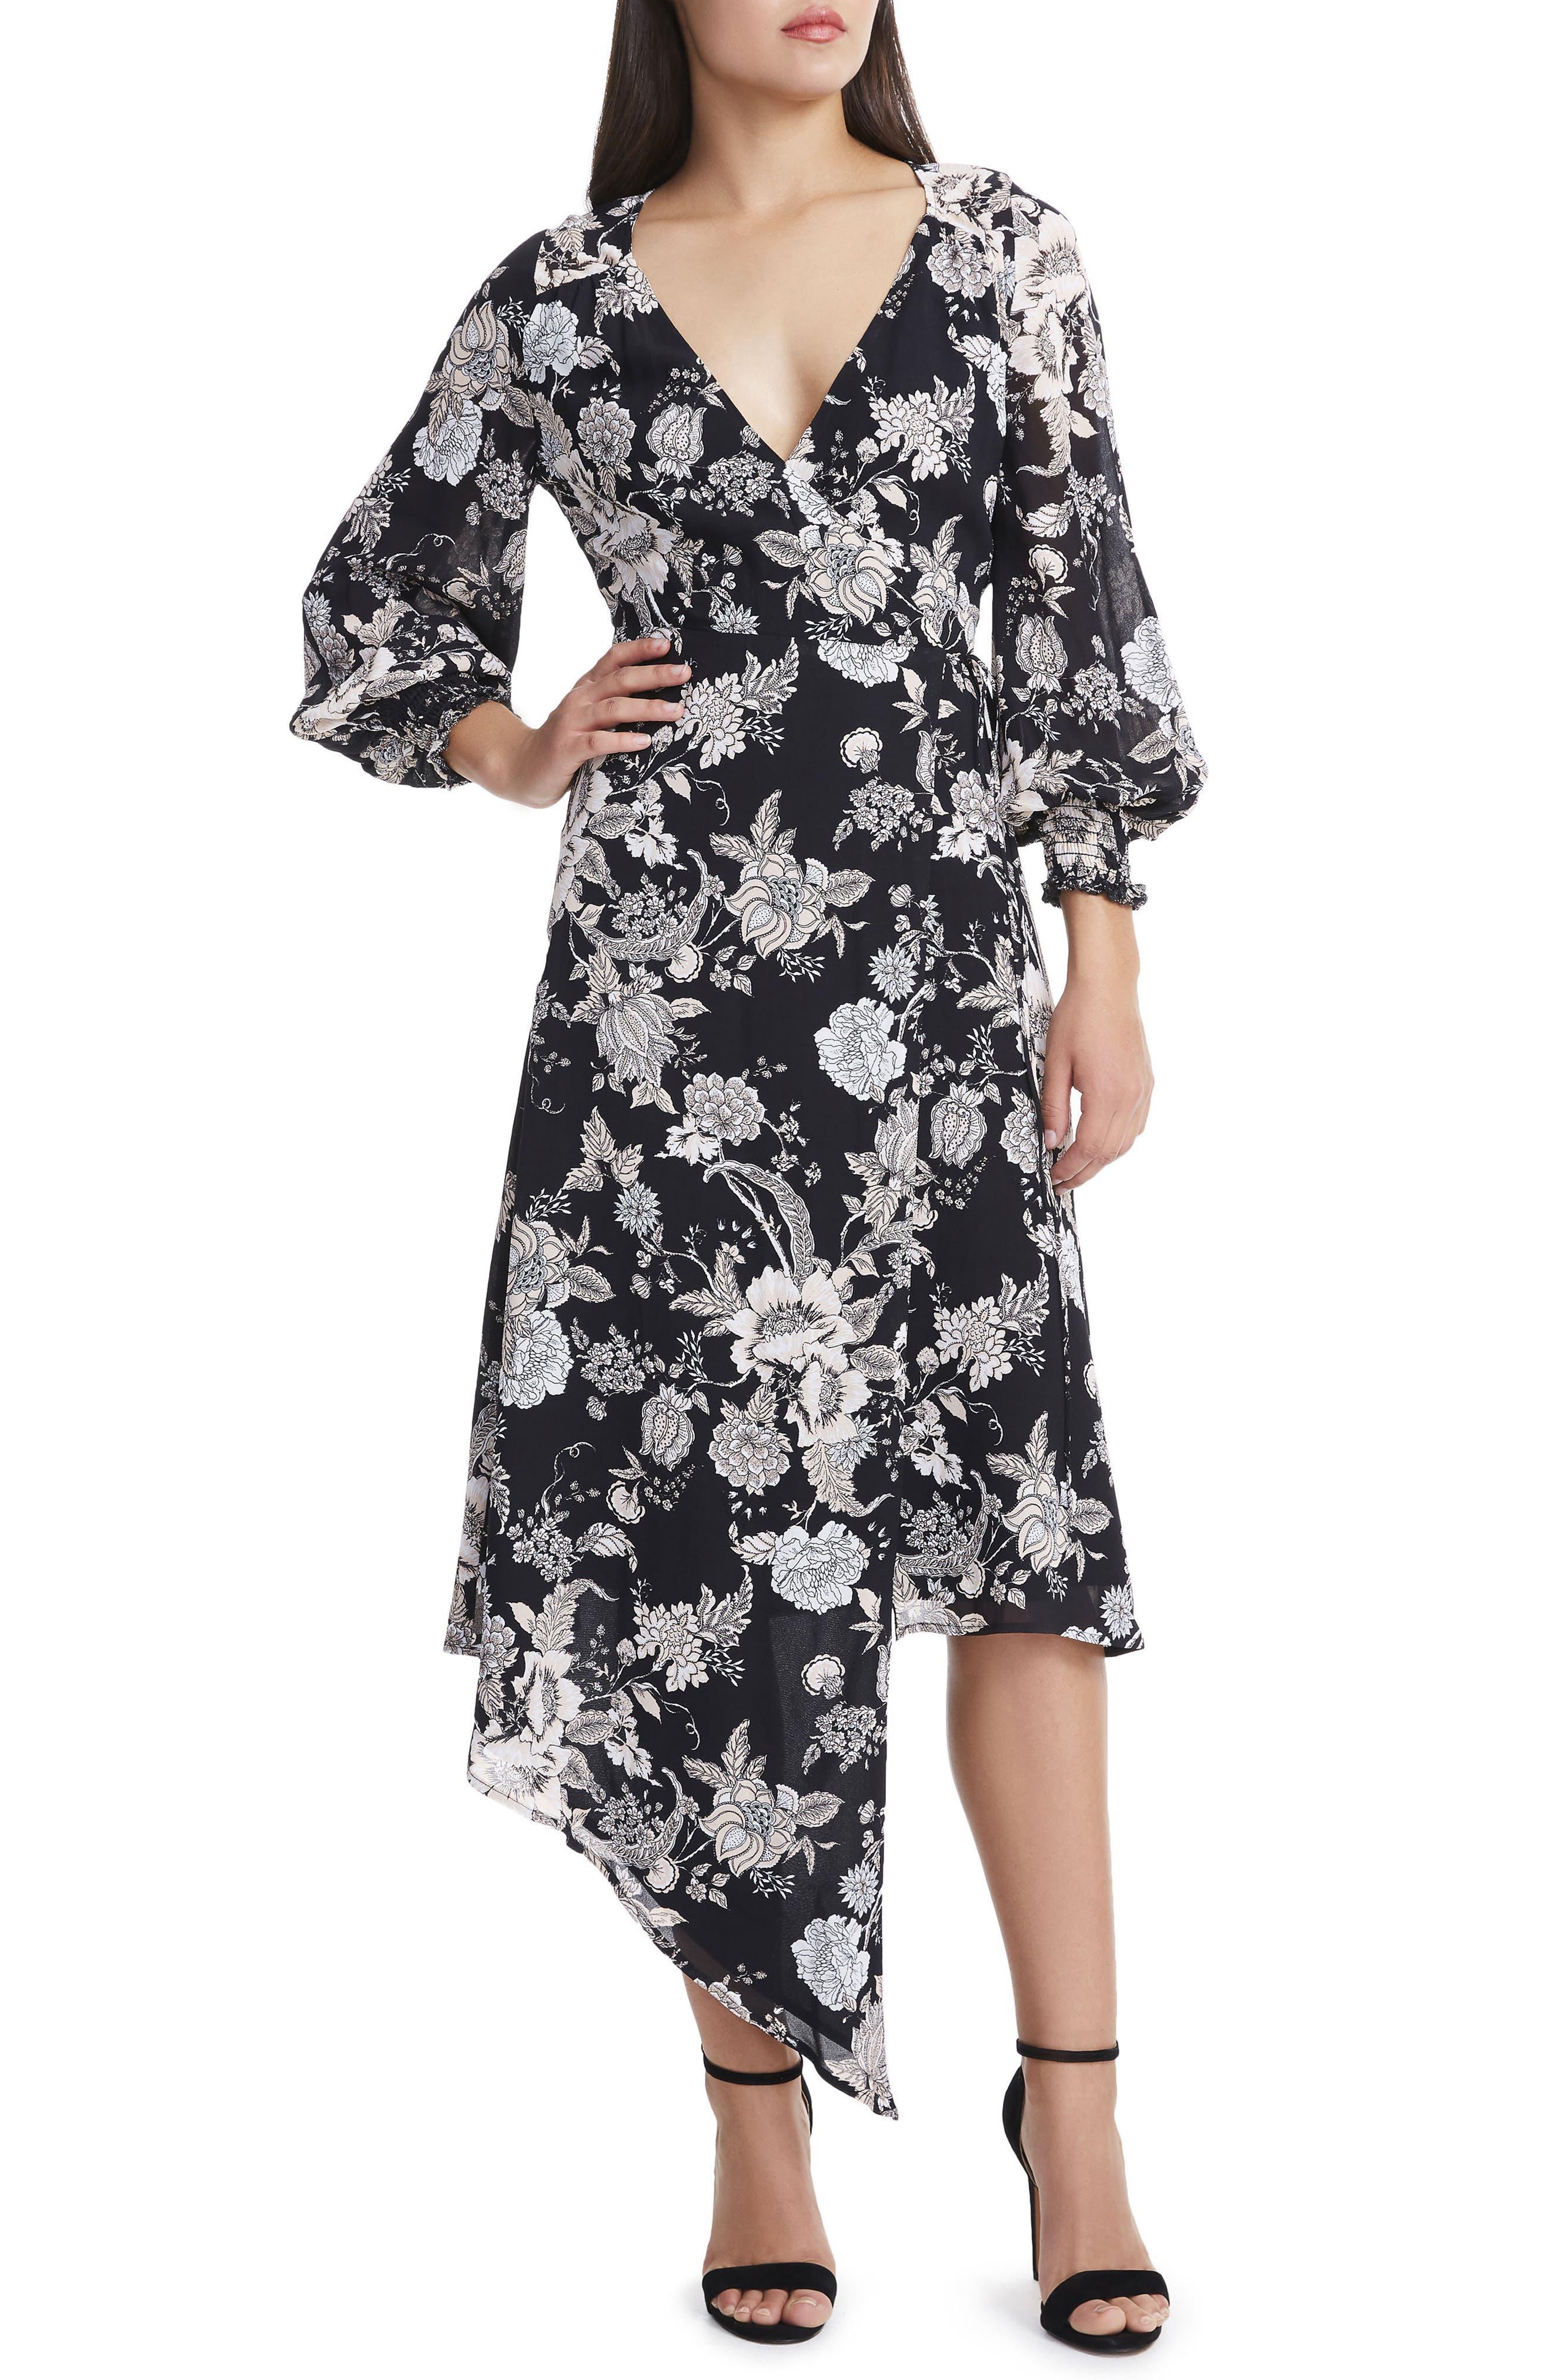 Amalfi Lantern Wrap Dress,                             Main thumbnail 1, color,                             001